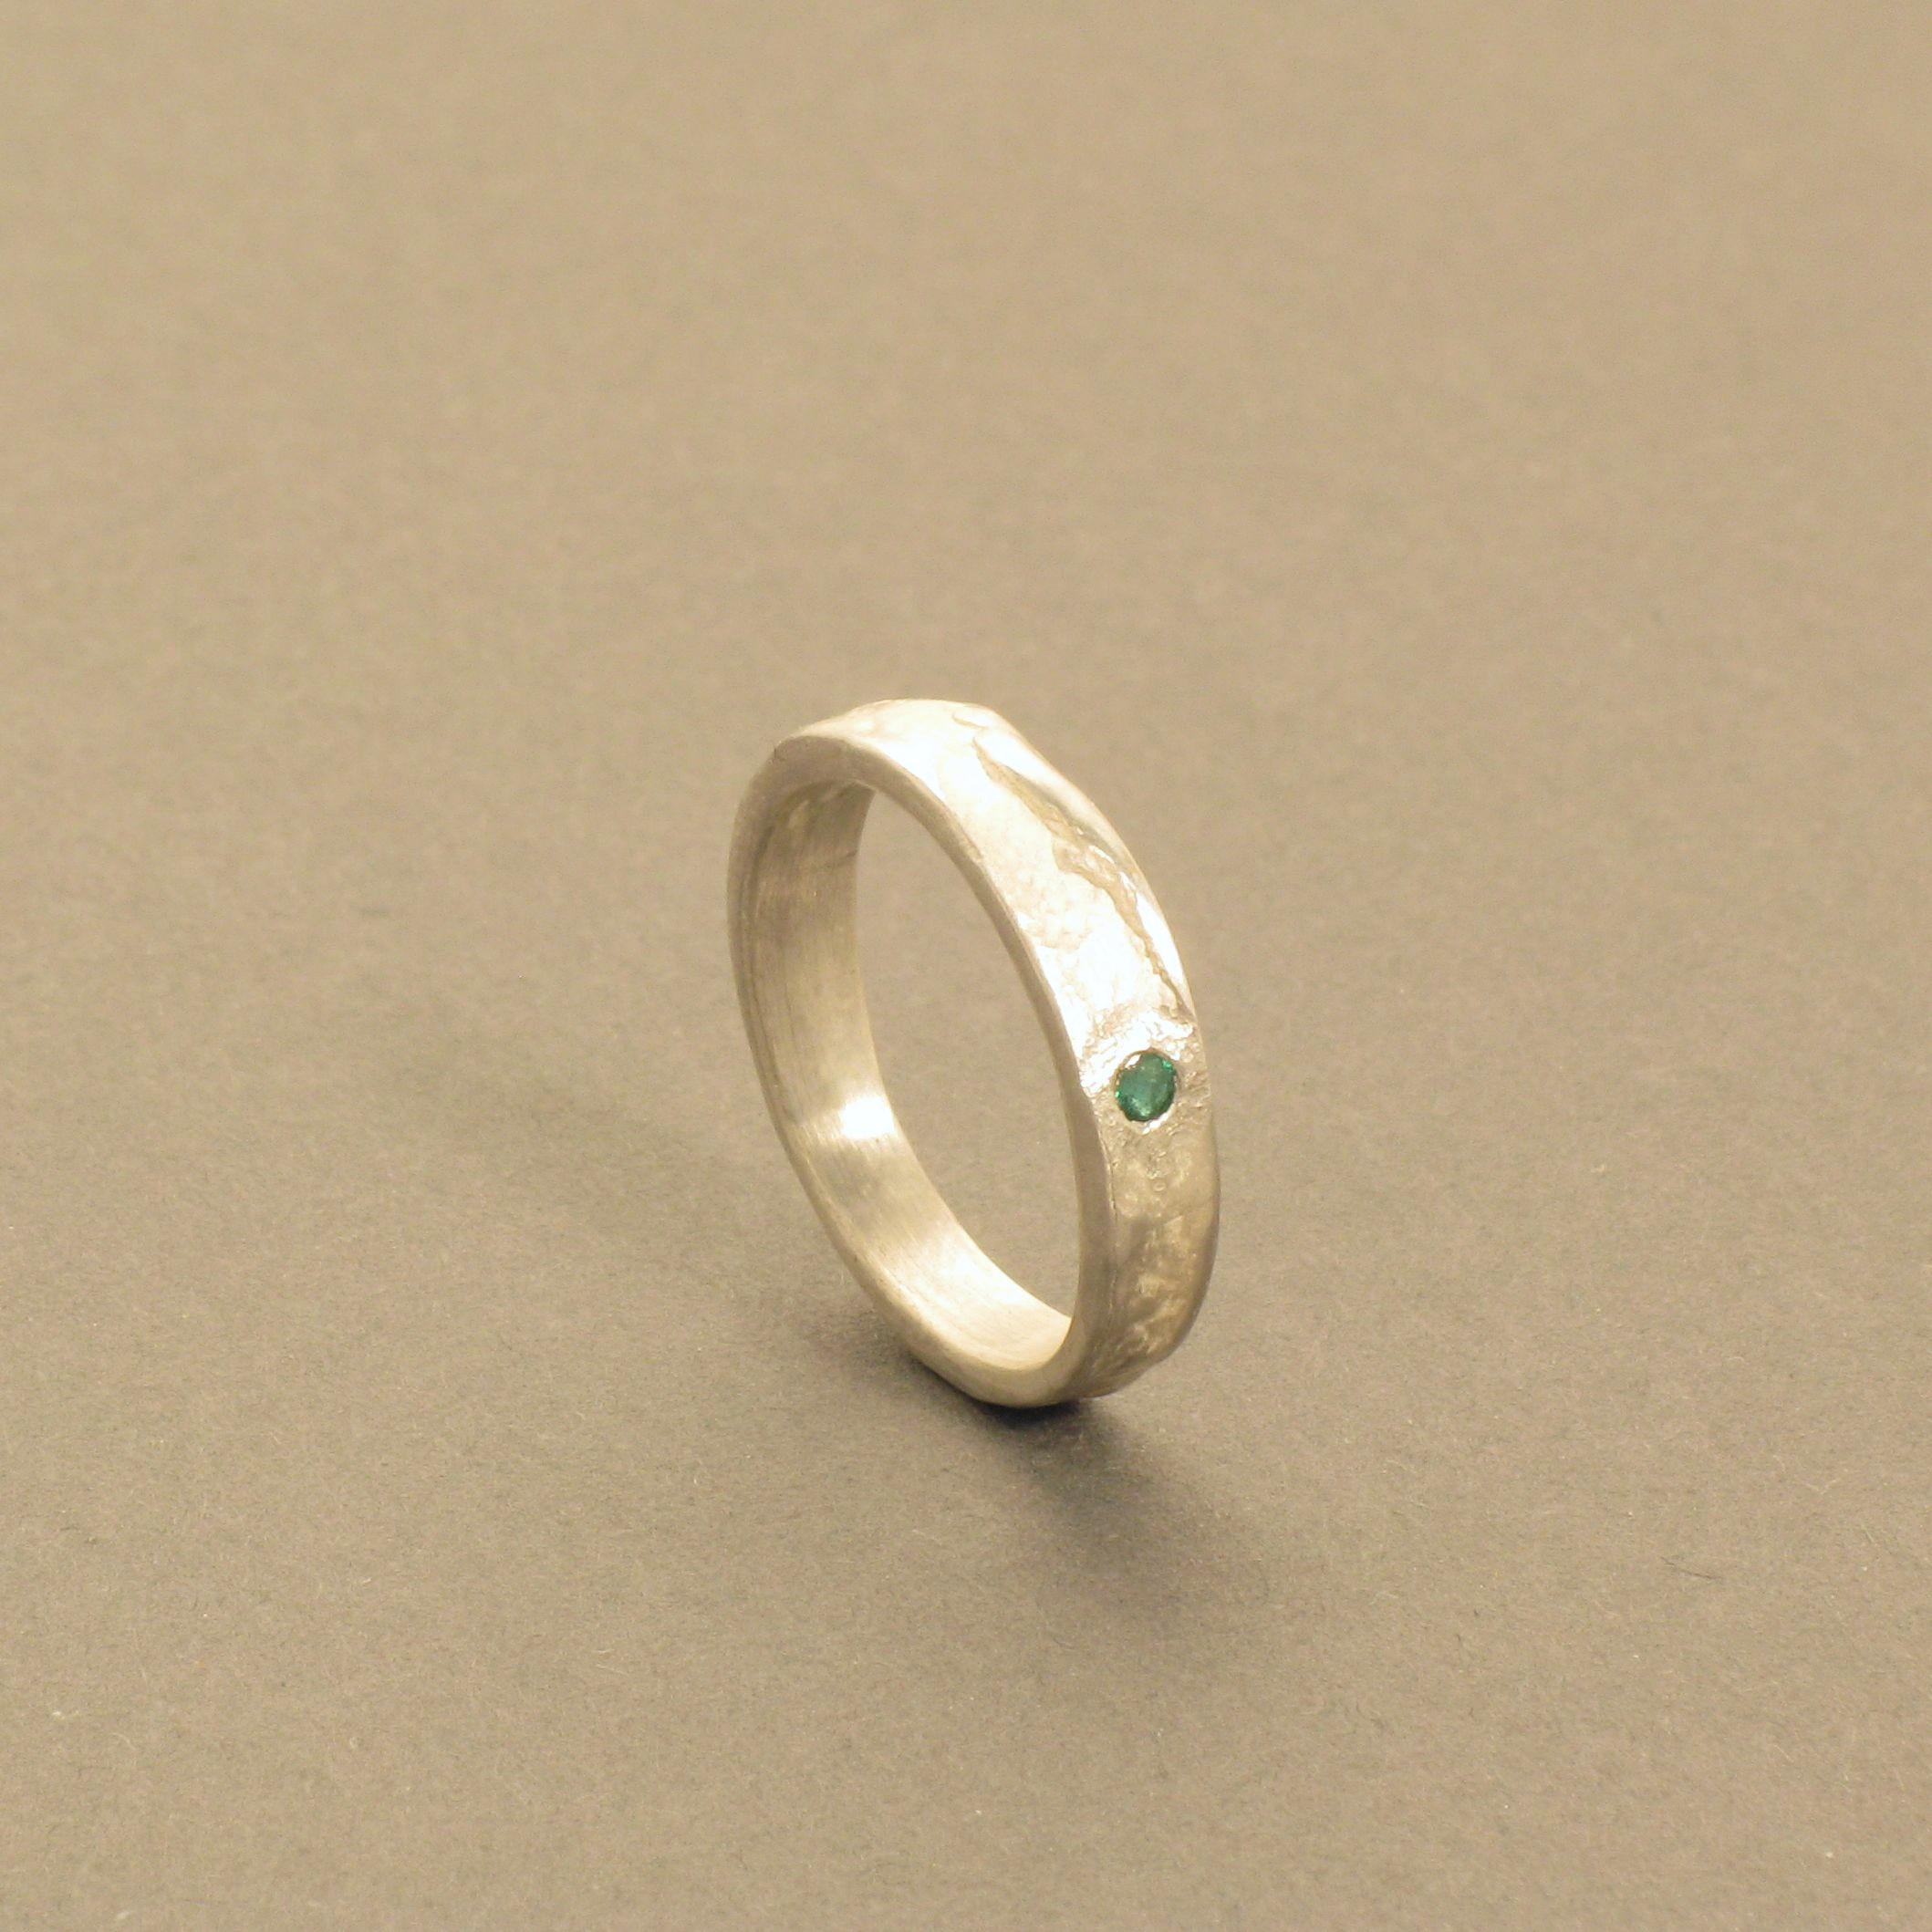 Silberring mit Smaragd